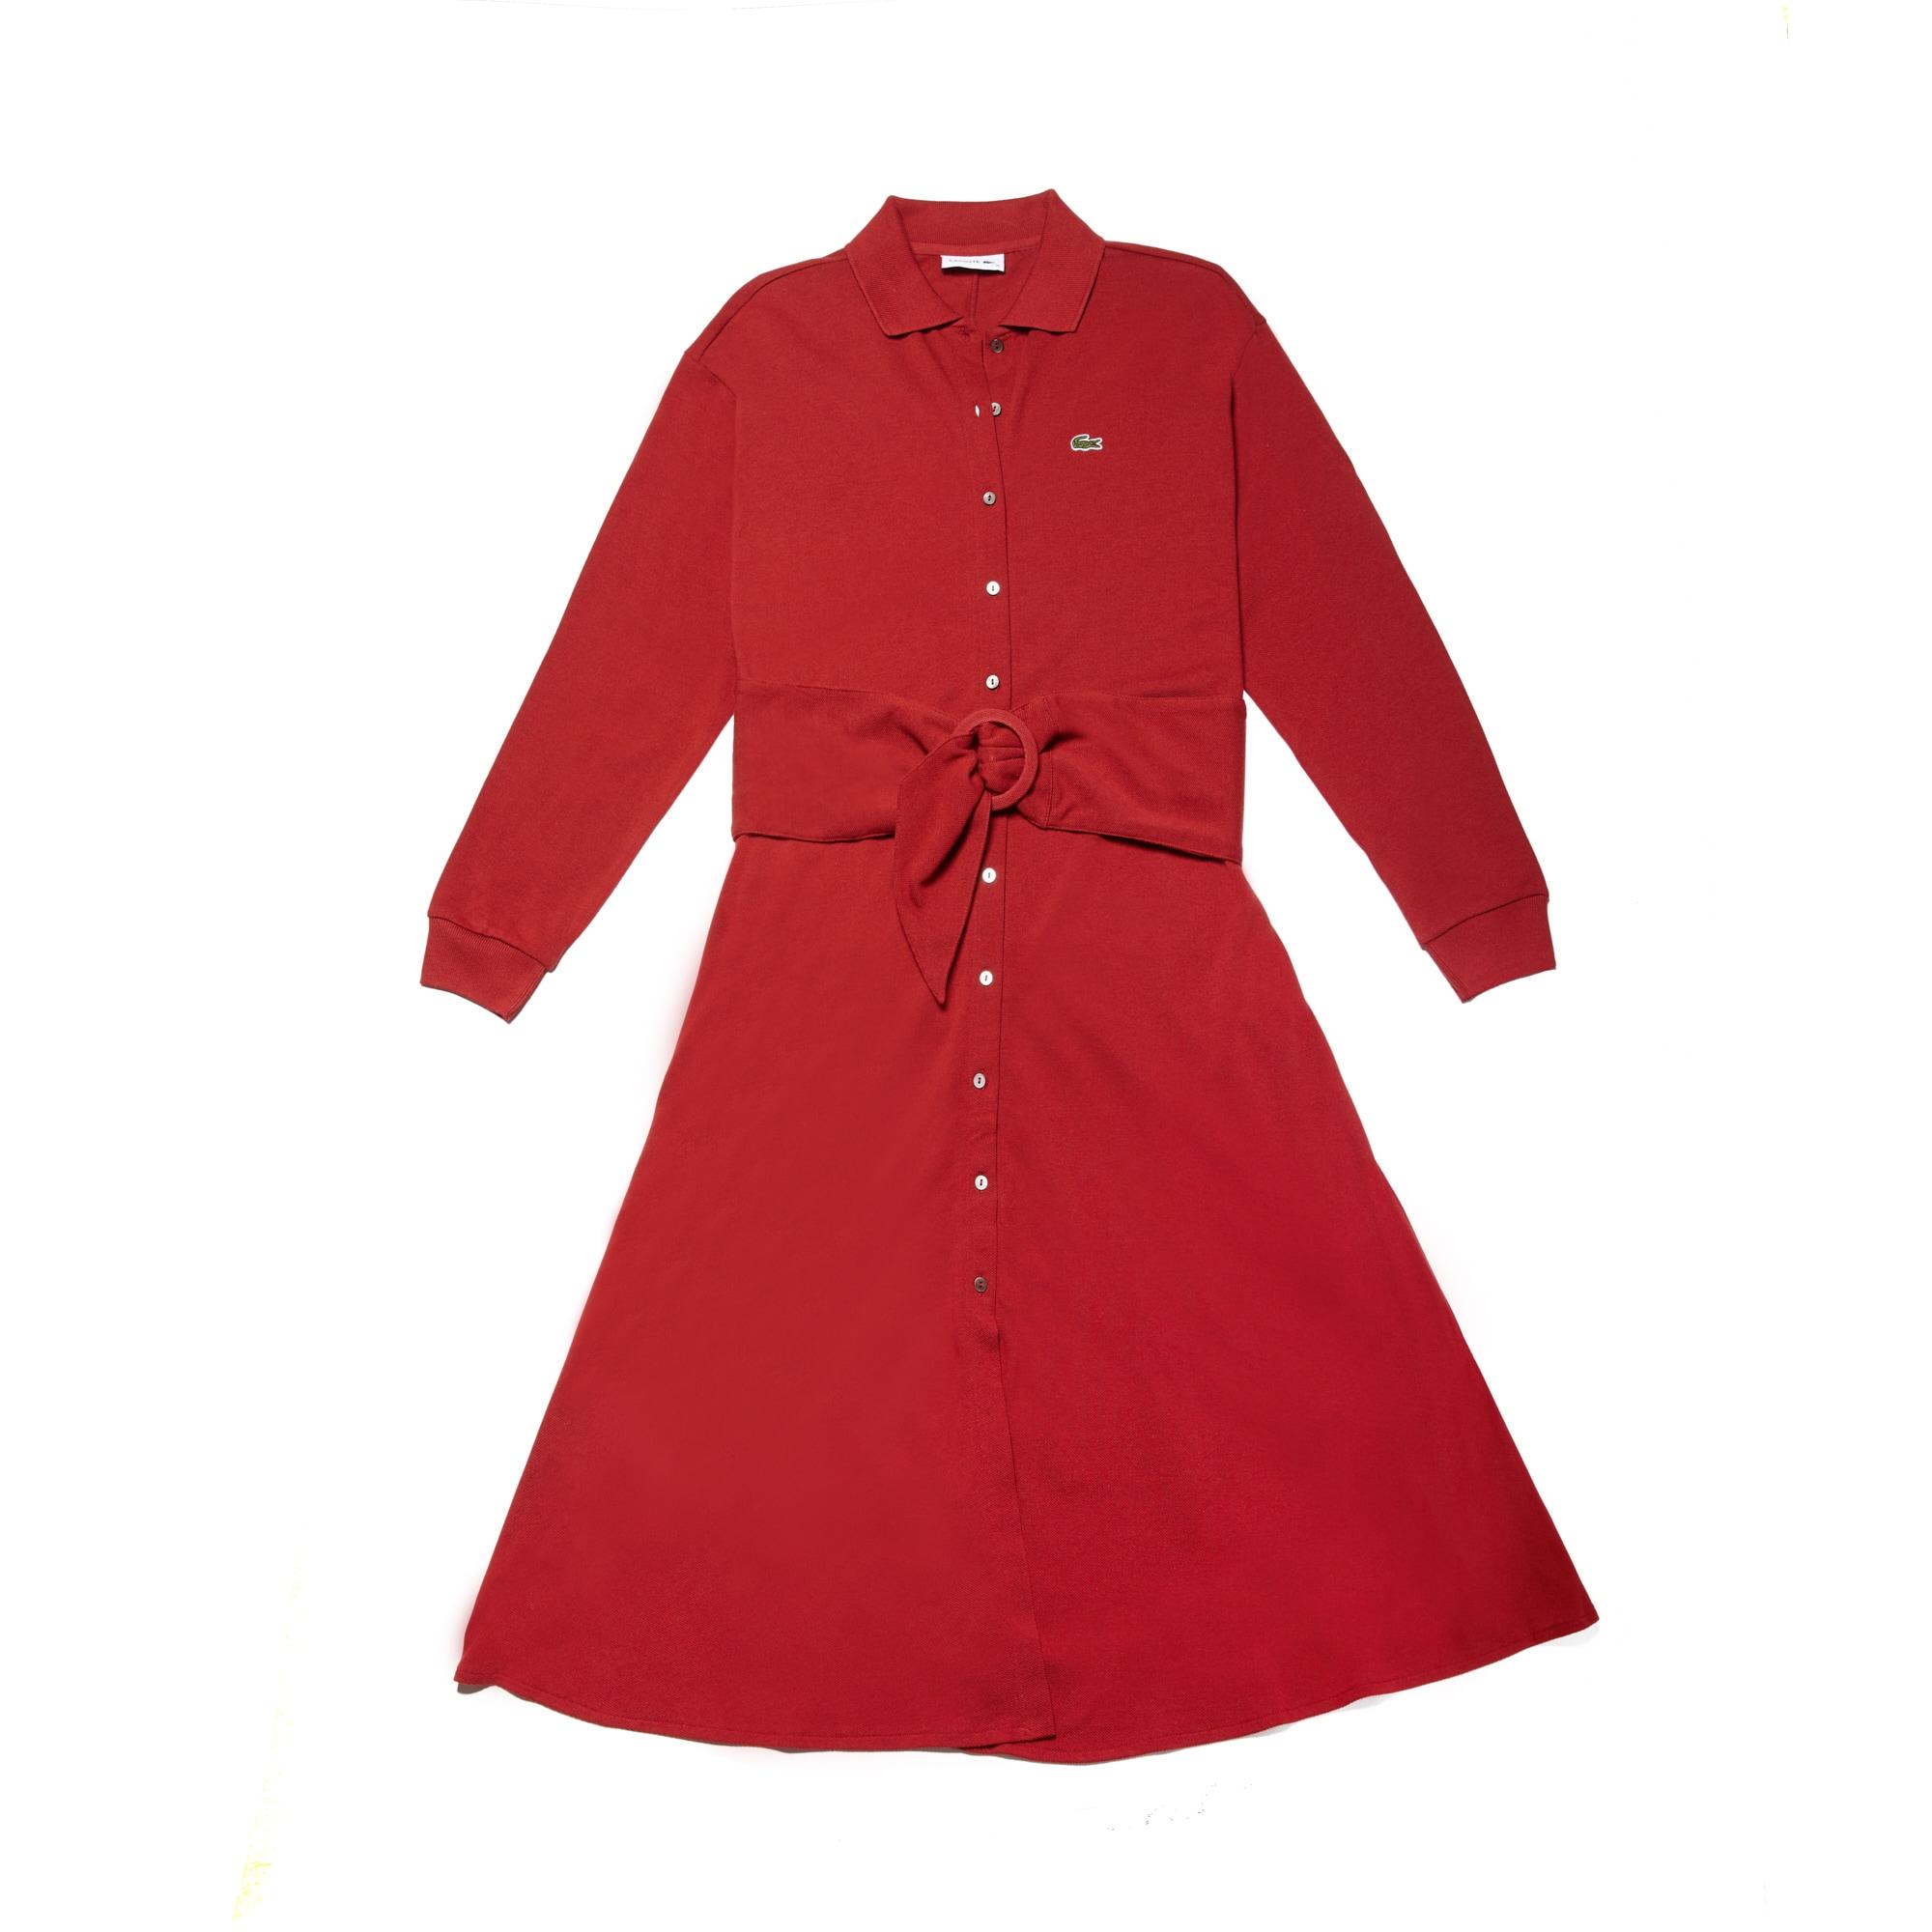 acba1a18b7b Women s Belted Cotton Petit Piqué Shirt Dress